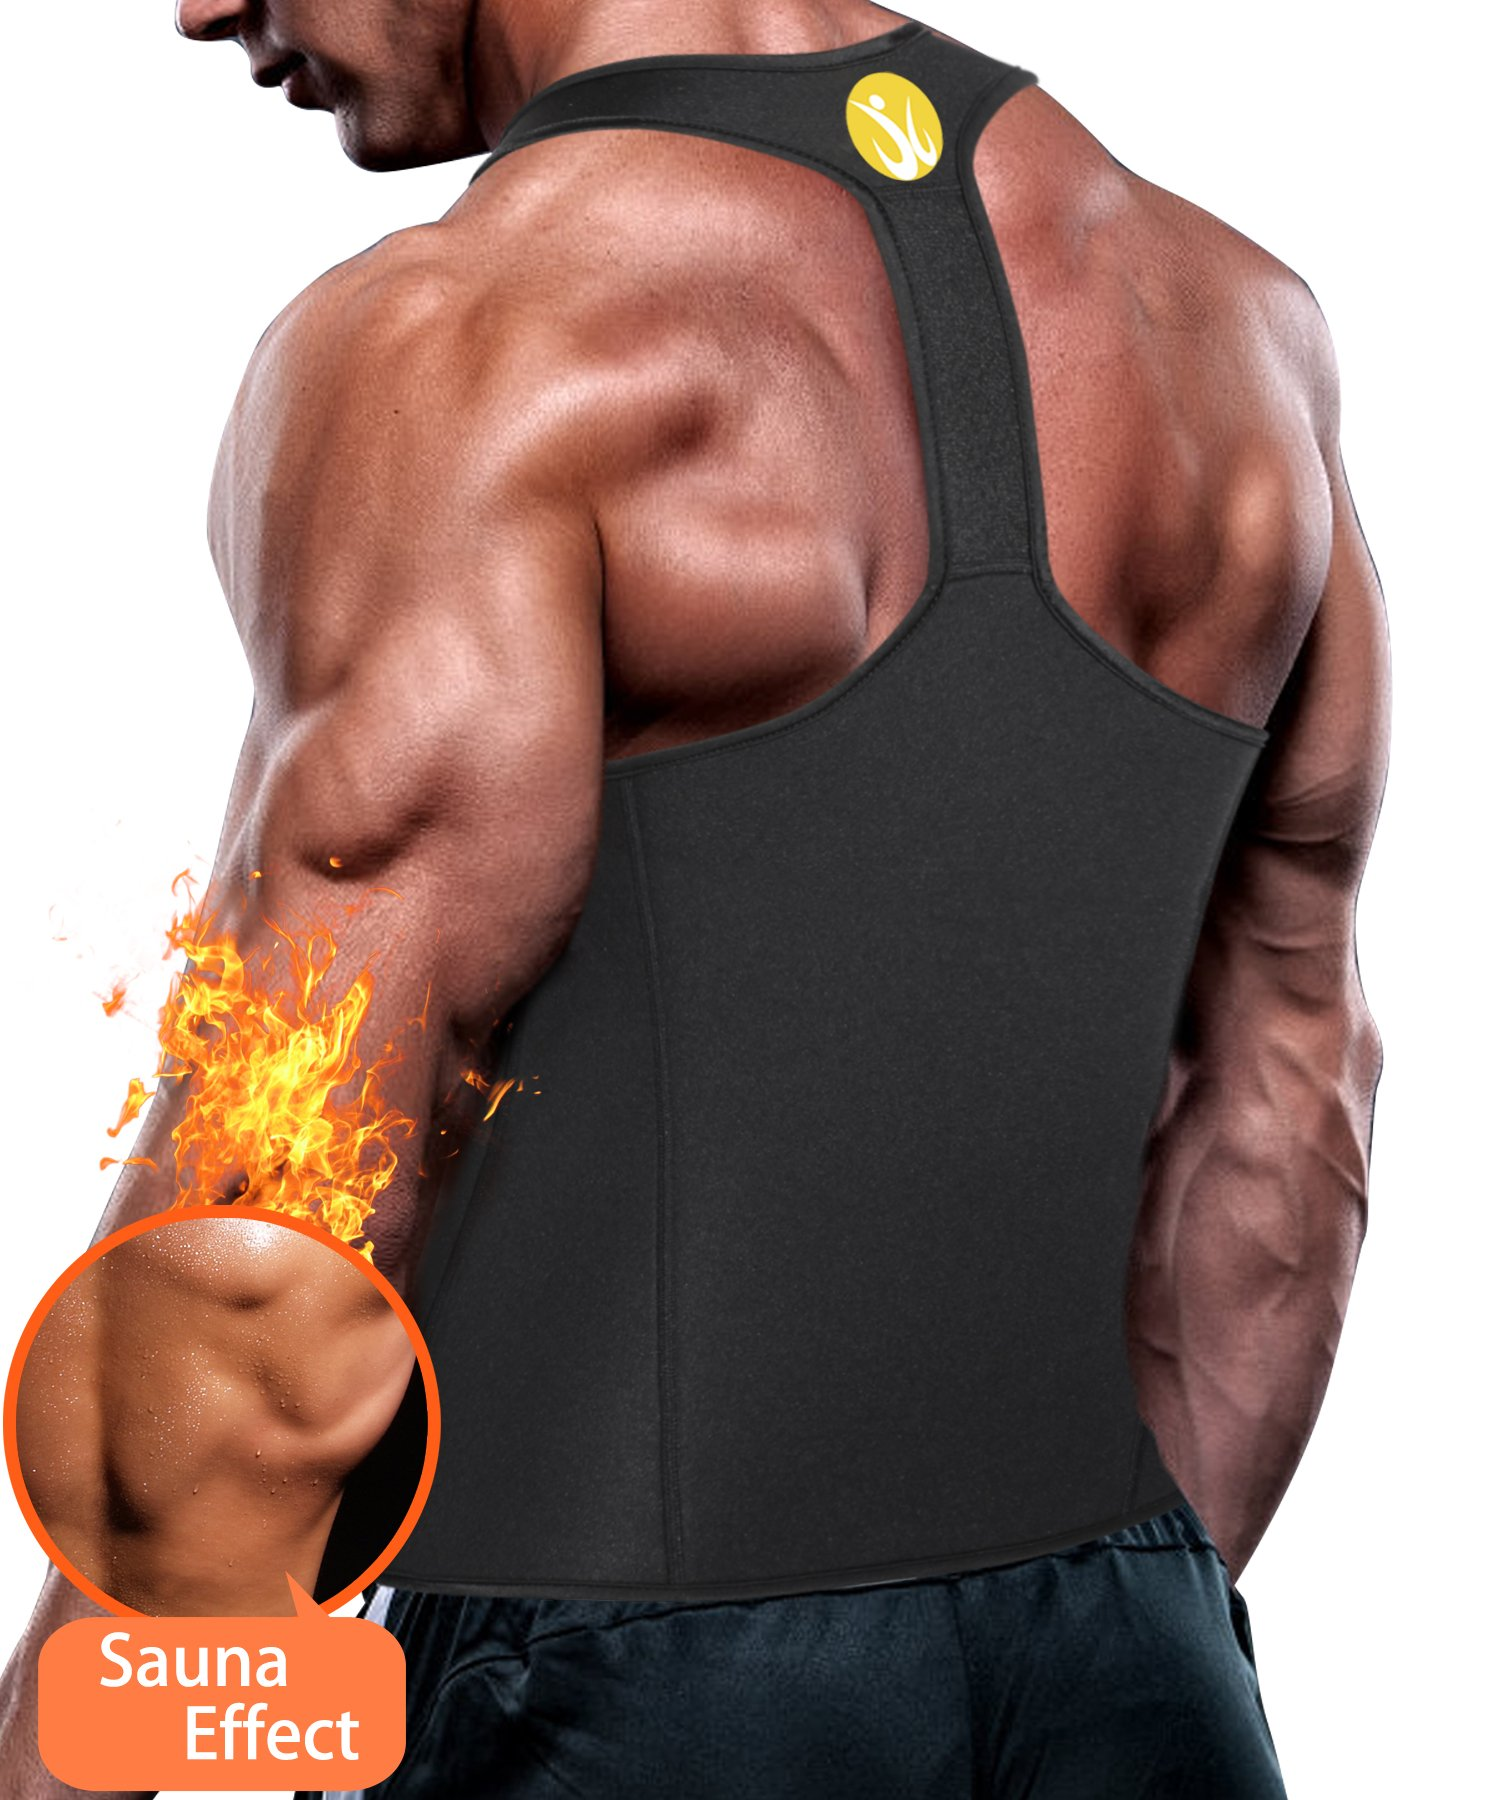 Junlan Men Workout Tank Top Vest Gym Shirt Weight Loss Dress Waist Body Shaper Sauna Suit Slim Corset Compression Clothes (XXXL, Black Sauna Tank)